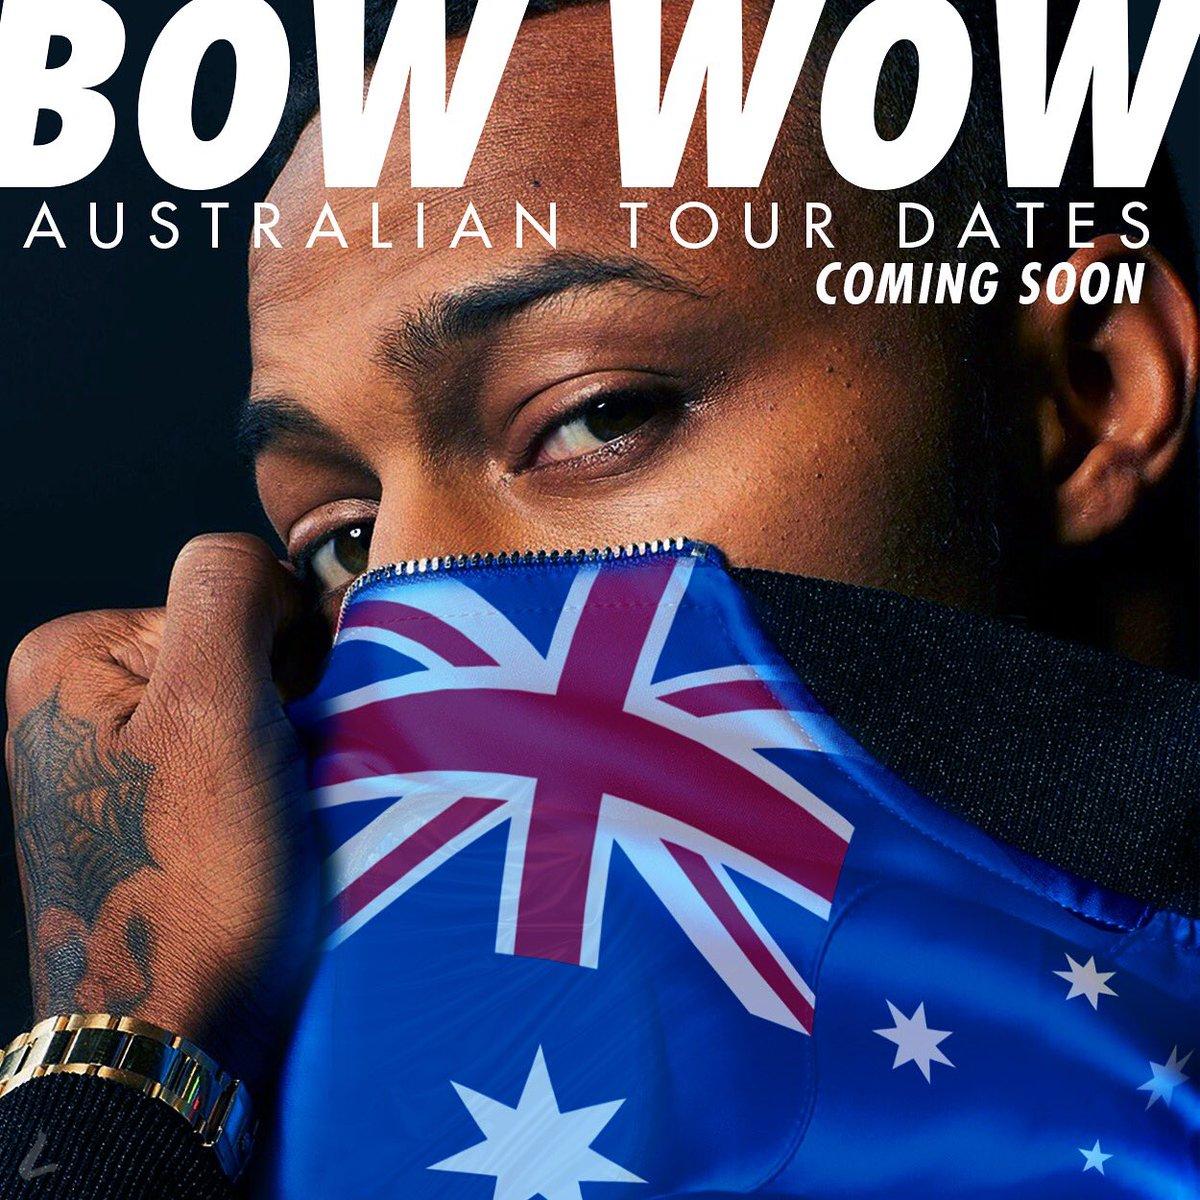 Australia get ready I&#39;m on the way August 25th - September 25th #Bowwow #RnbFridays<br>http://pic.twitter.com/U9YRnltxSF